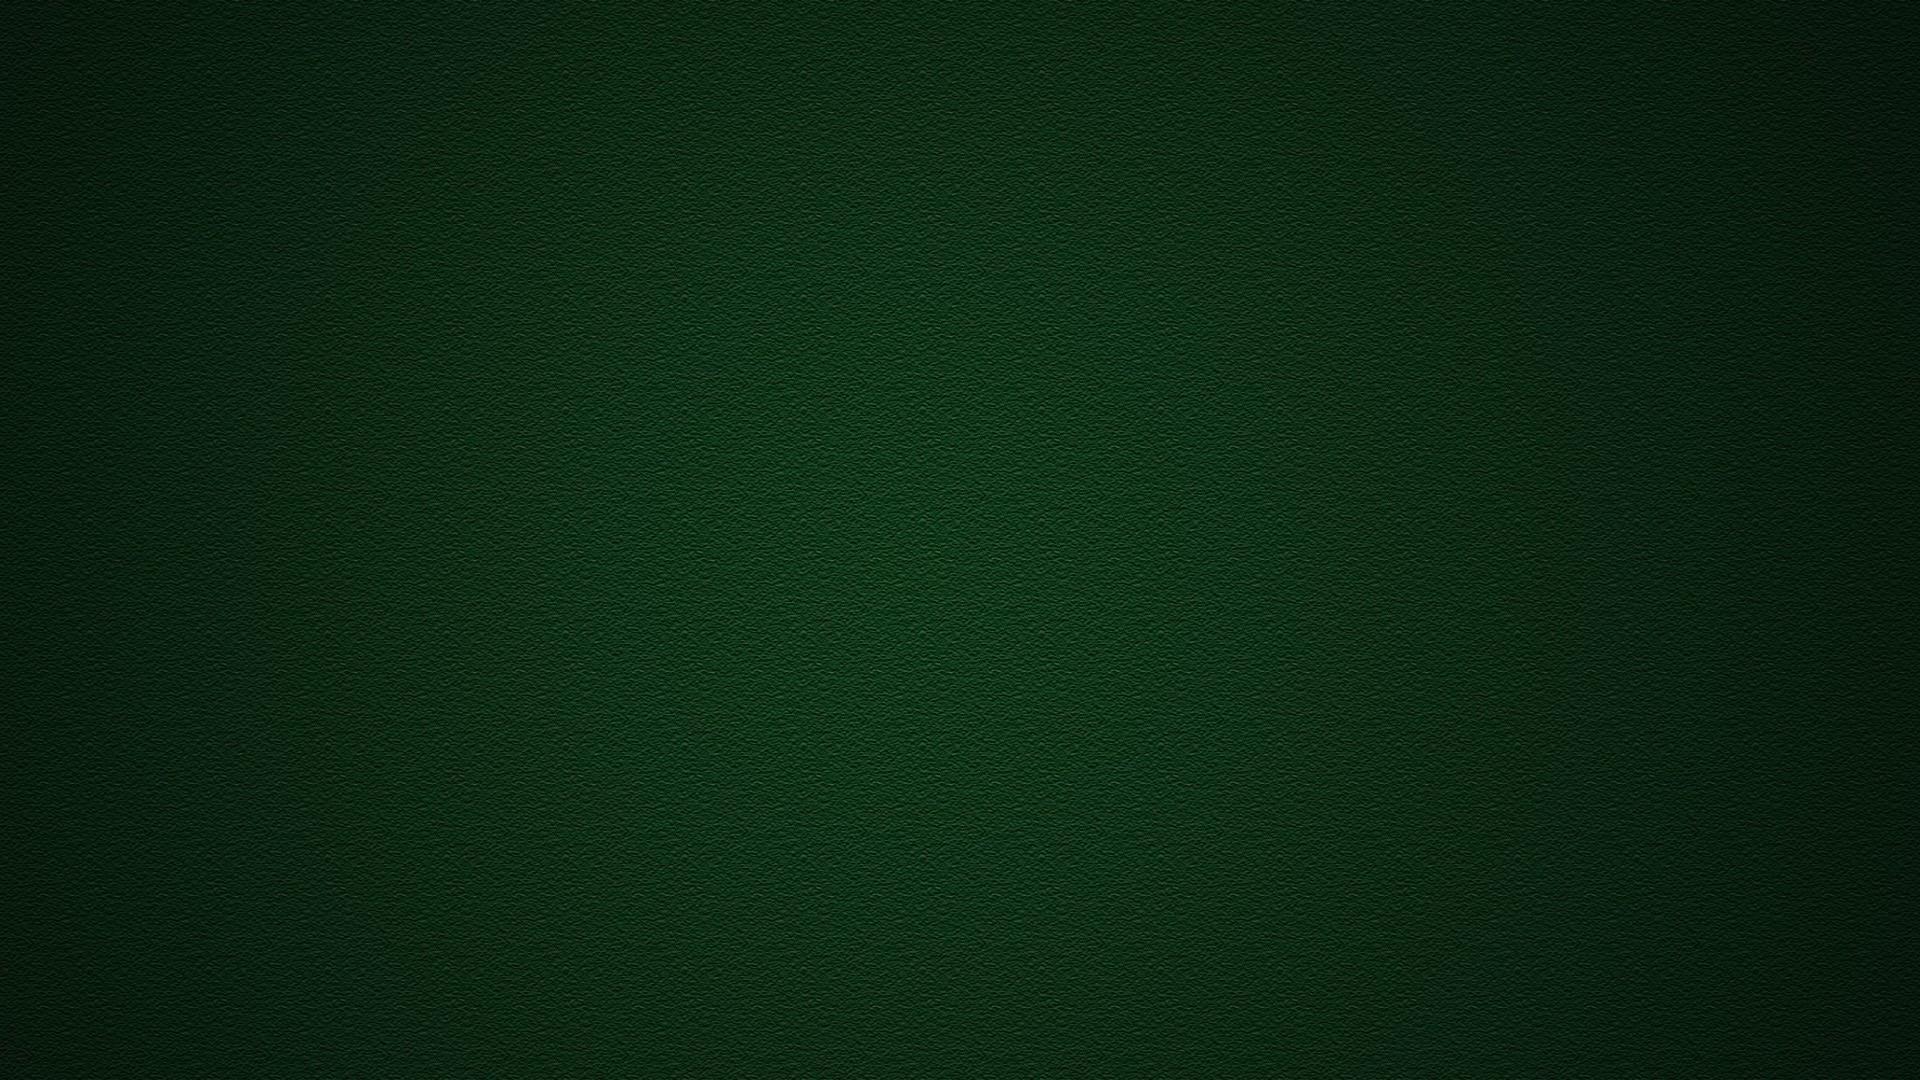 Green Dark Wallpapers - Wallpaper Cave